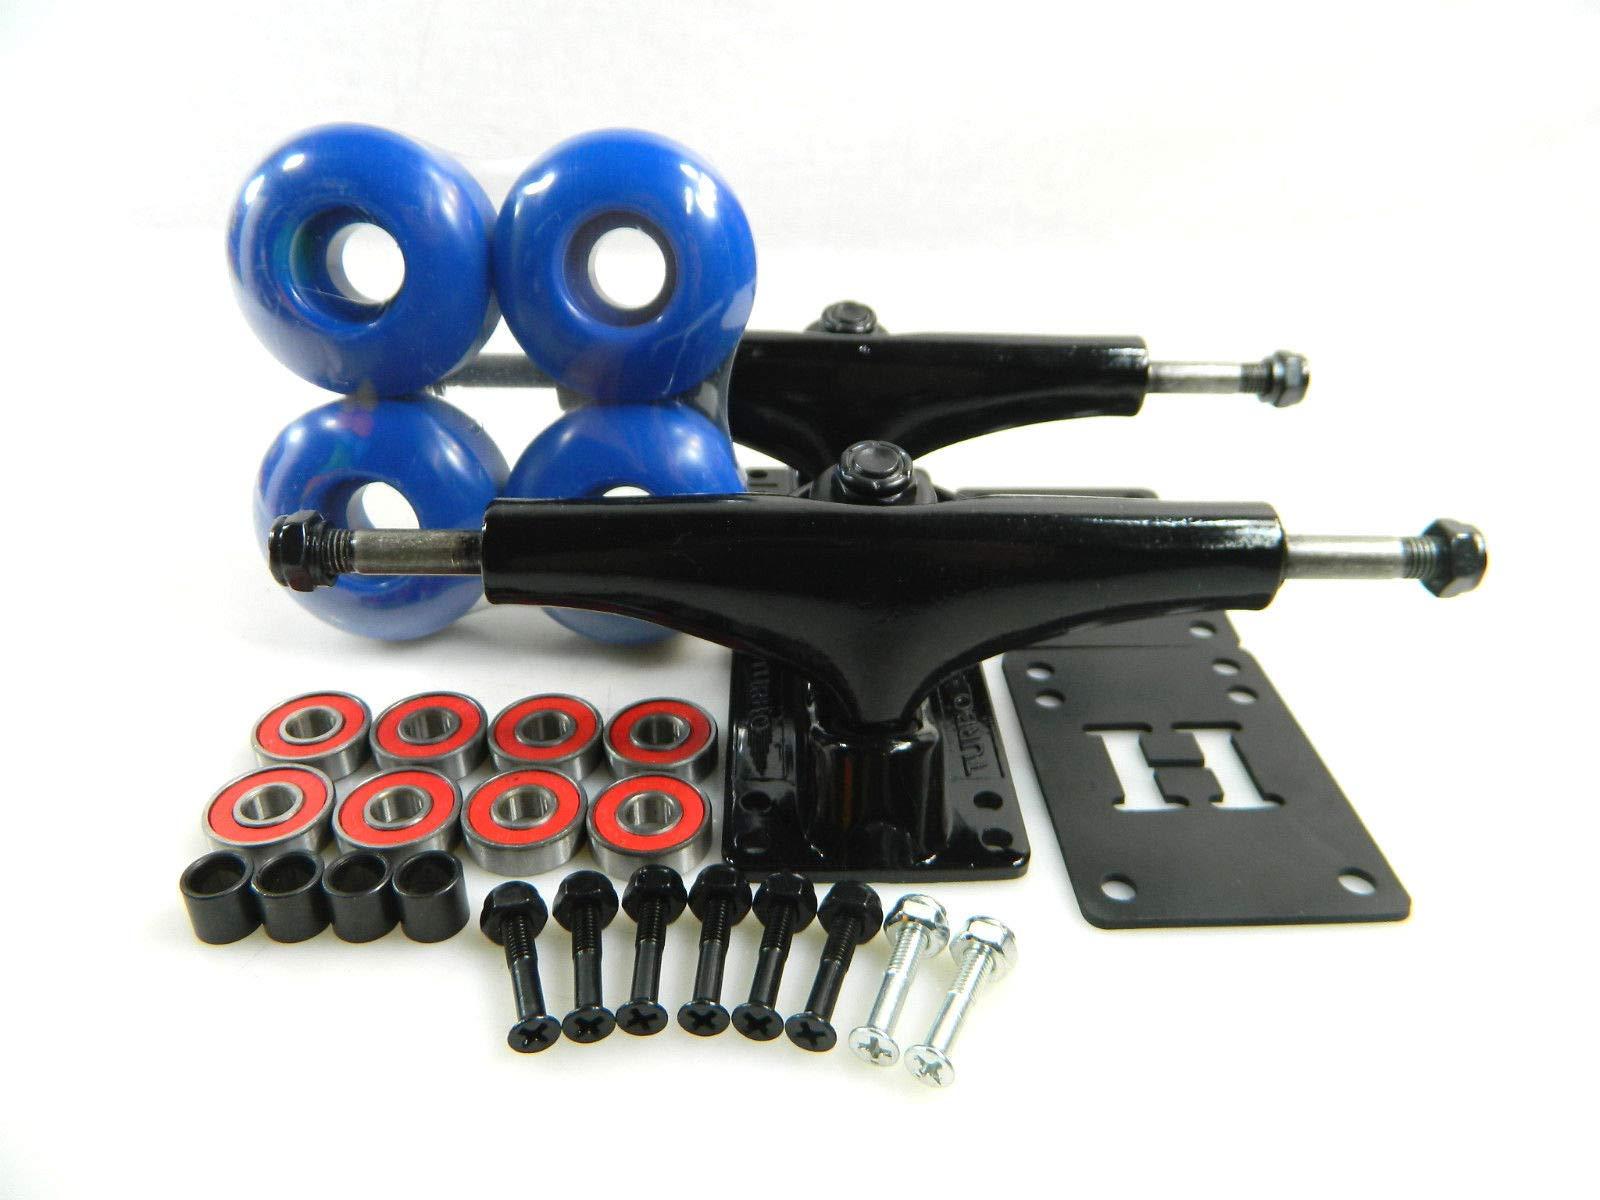 Blue Turbo 5.25 Blk Skateboard Trucks + 52Mm Color Wheels + ABEC 7 Bearings Riser Pad